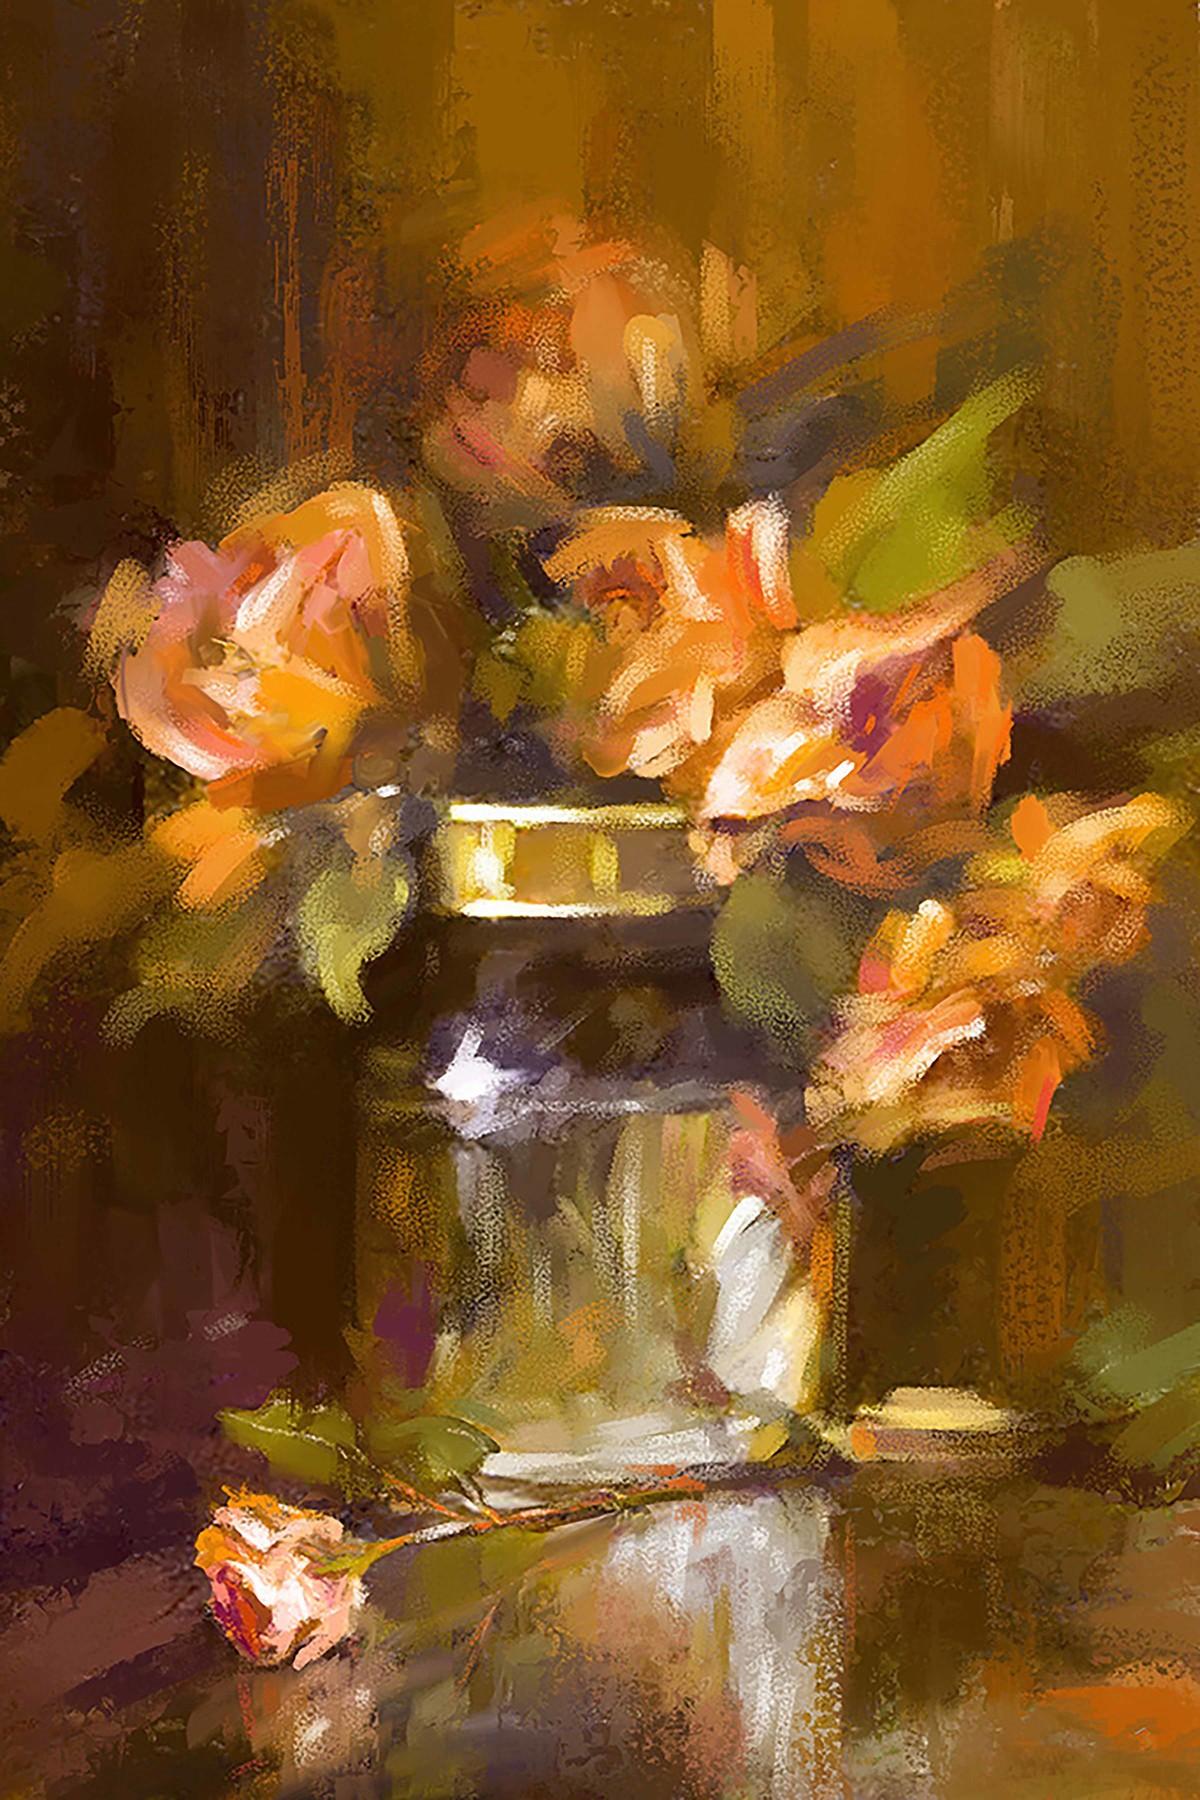 Still Life with Flowers - 27 Digital Print by The Print Studio,Digital